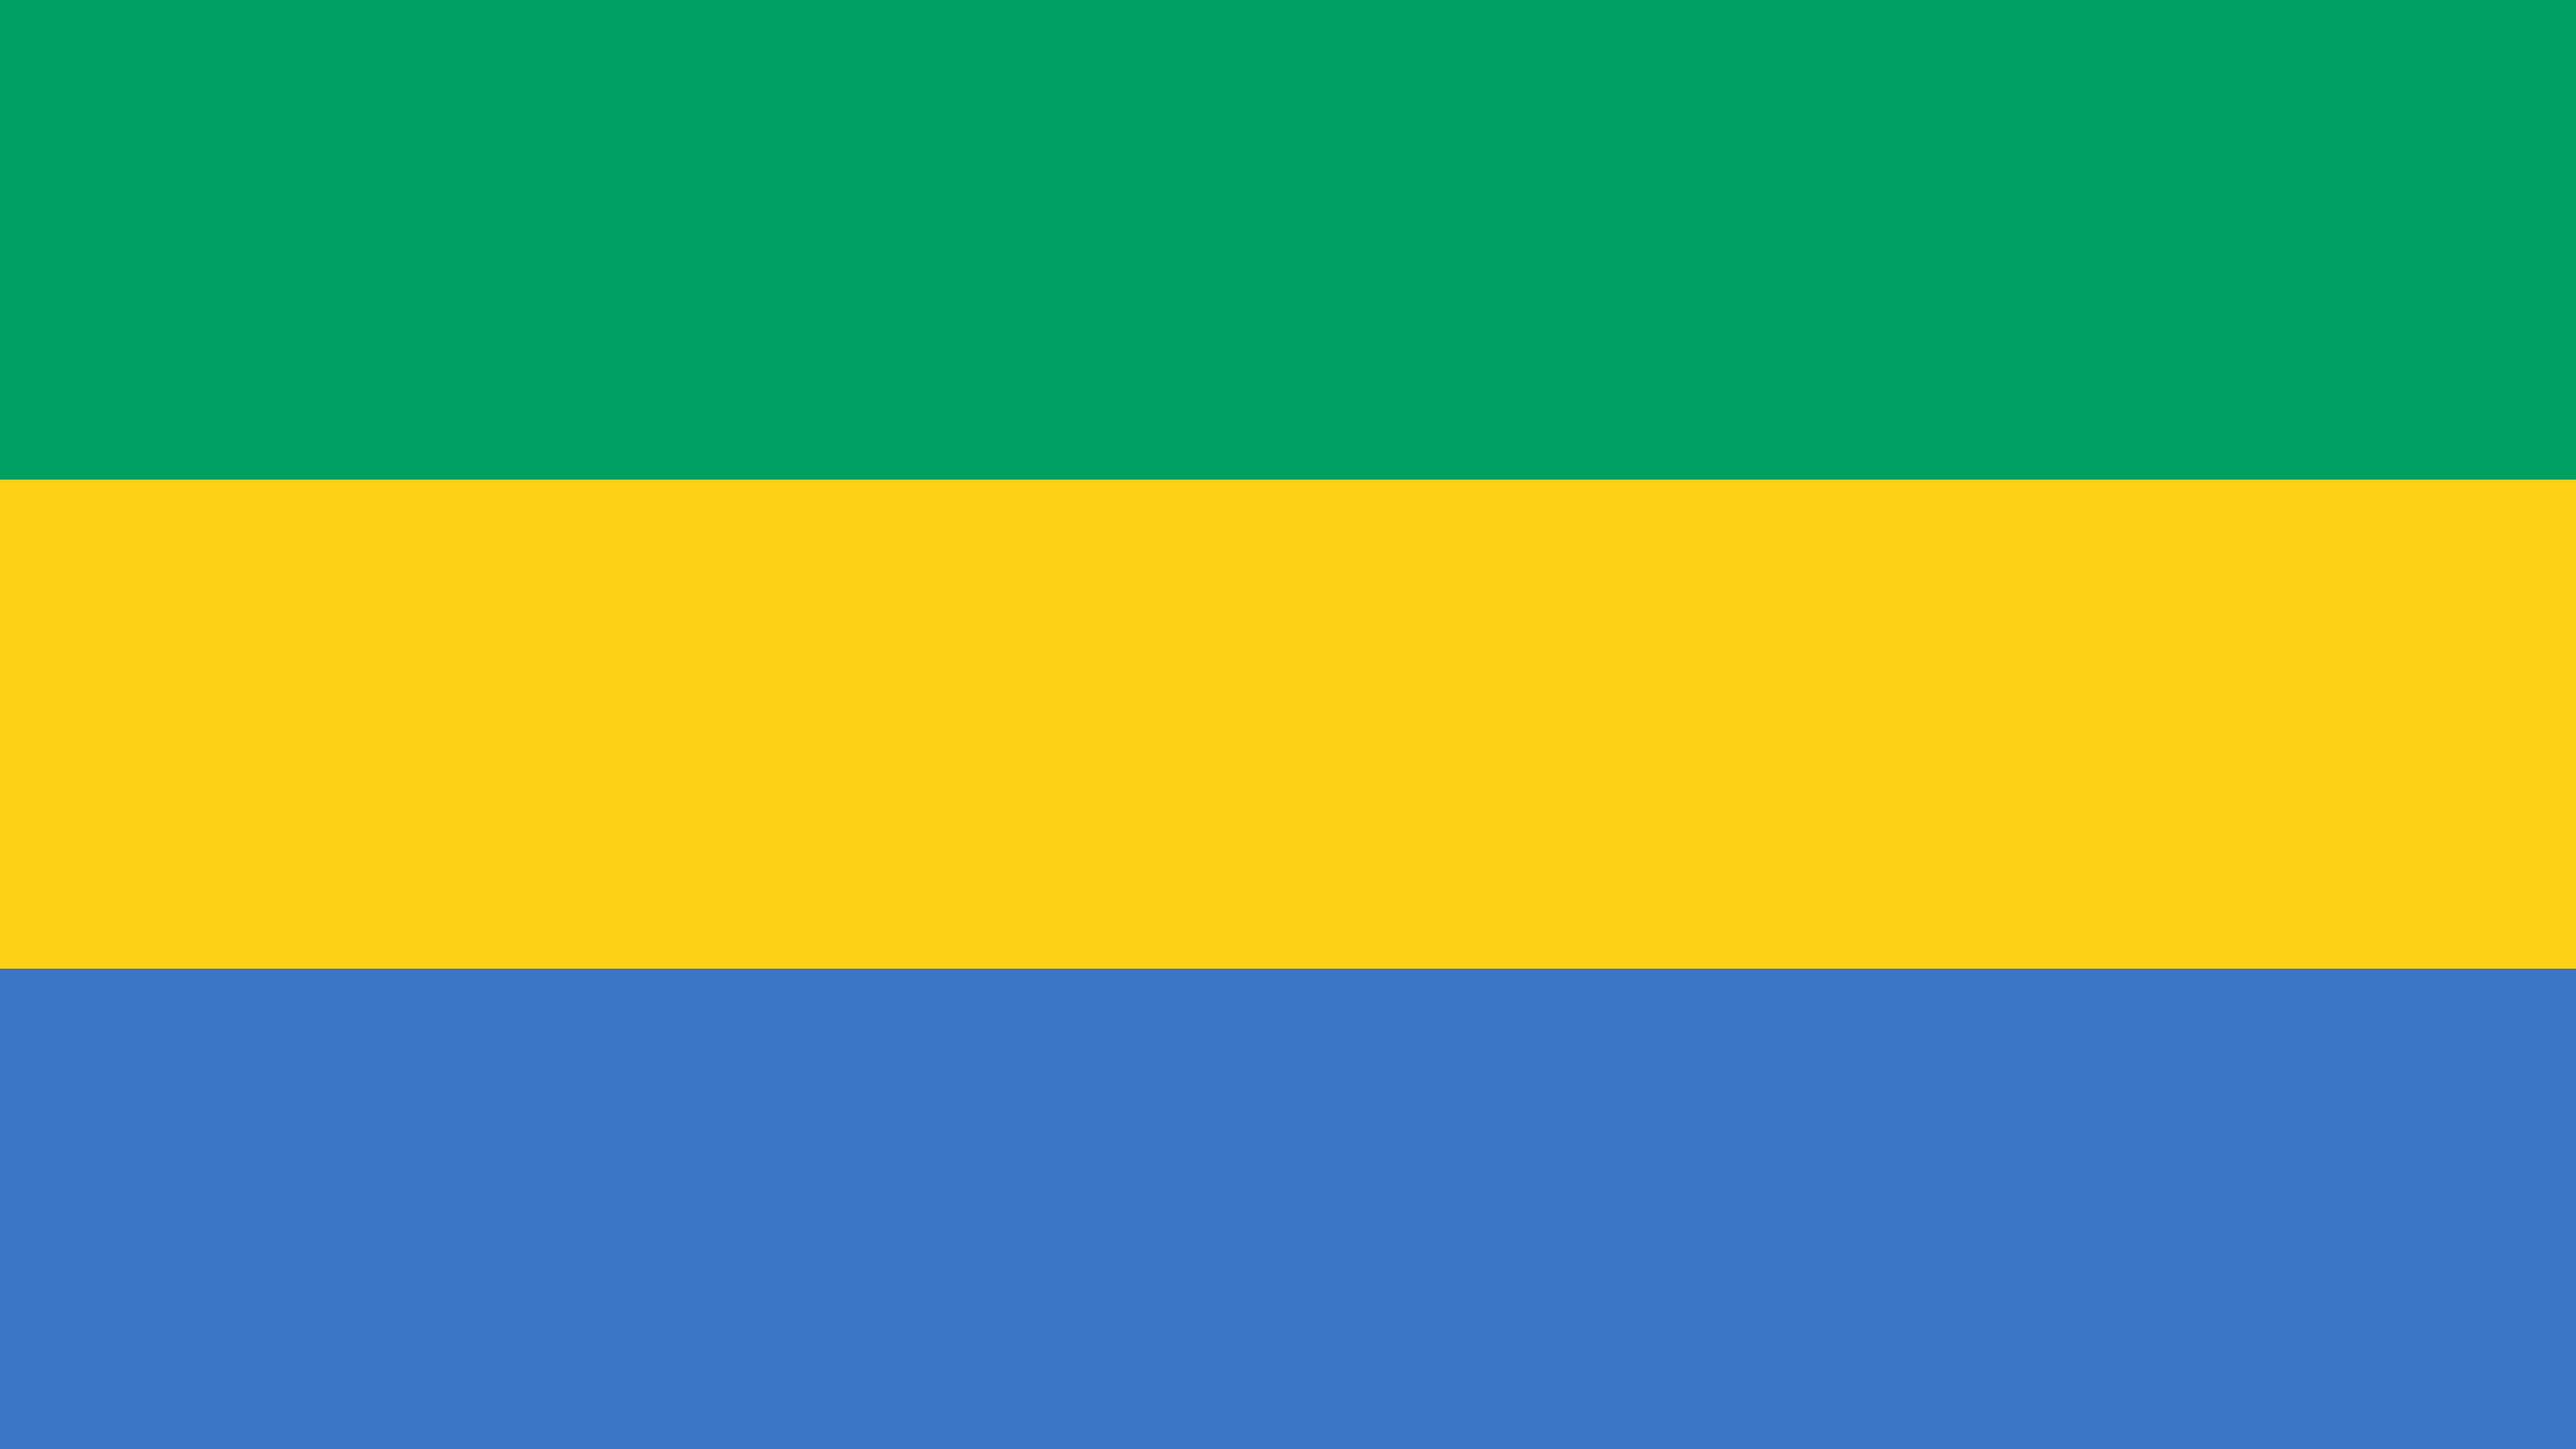 Gabon Flag UHD 4K Wallpaper Pixelz 3840x2160